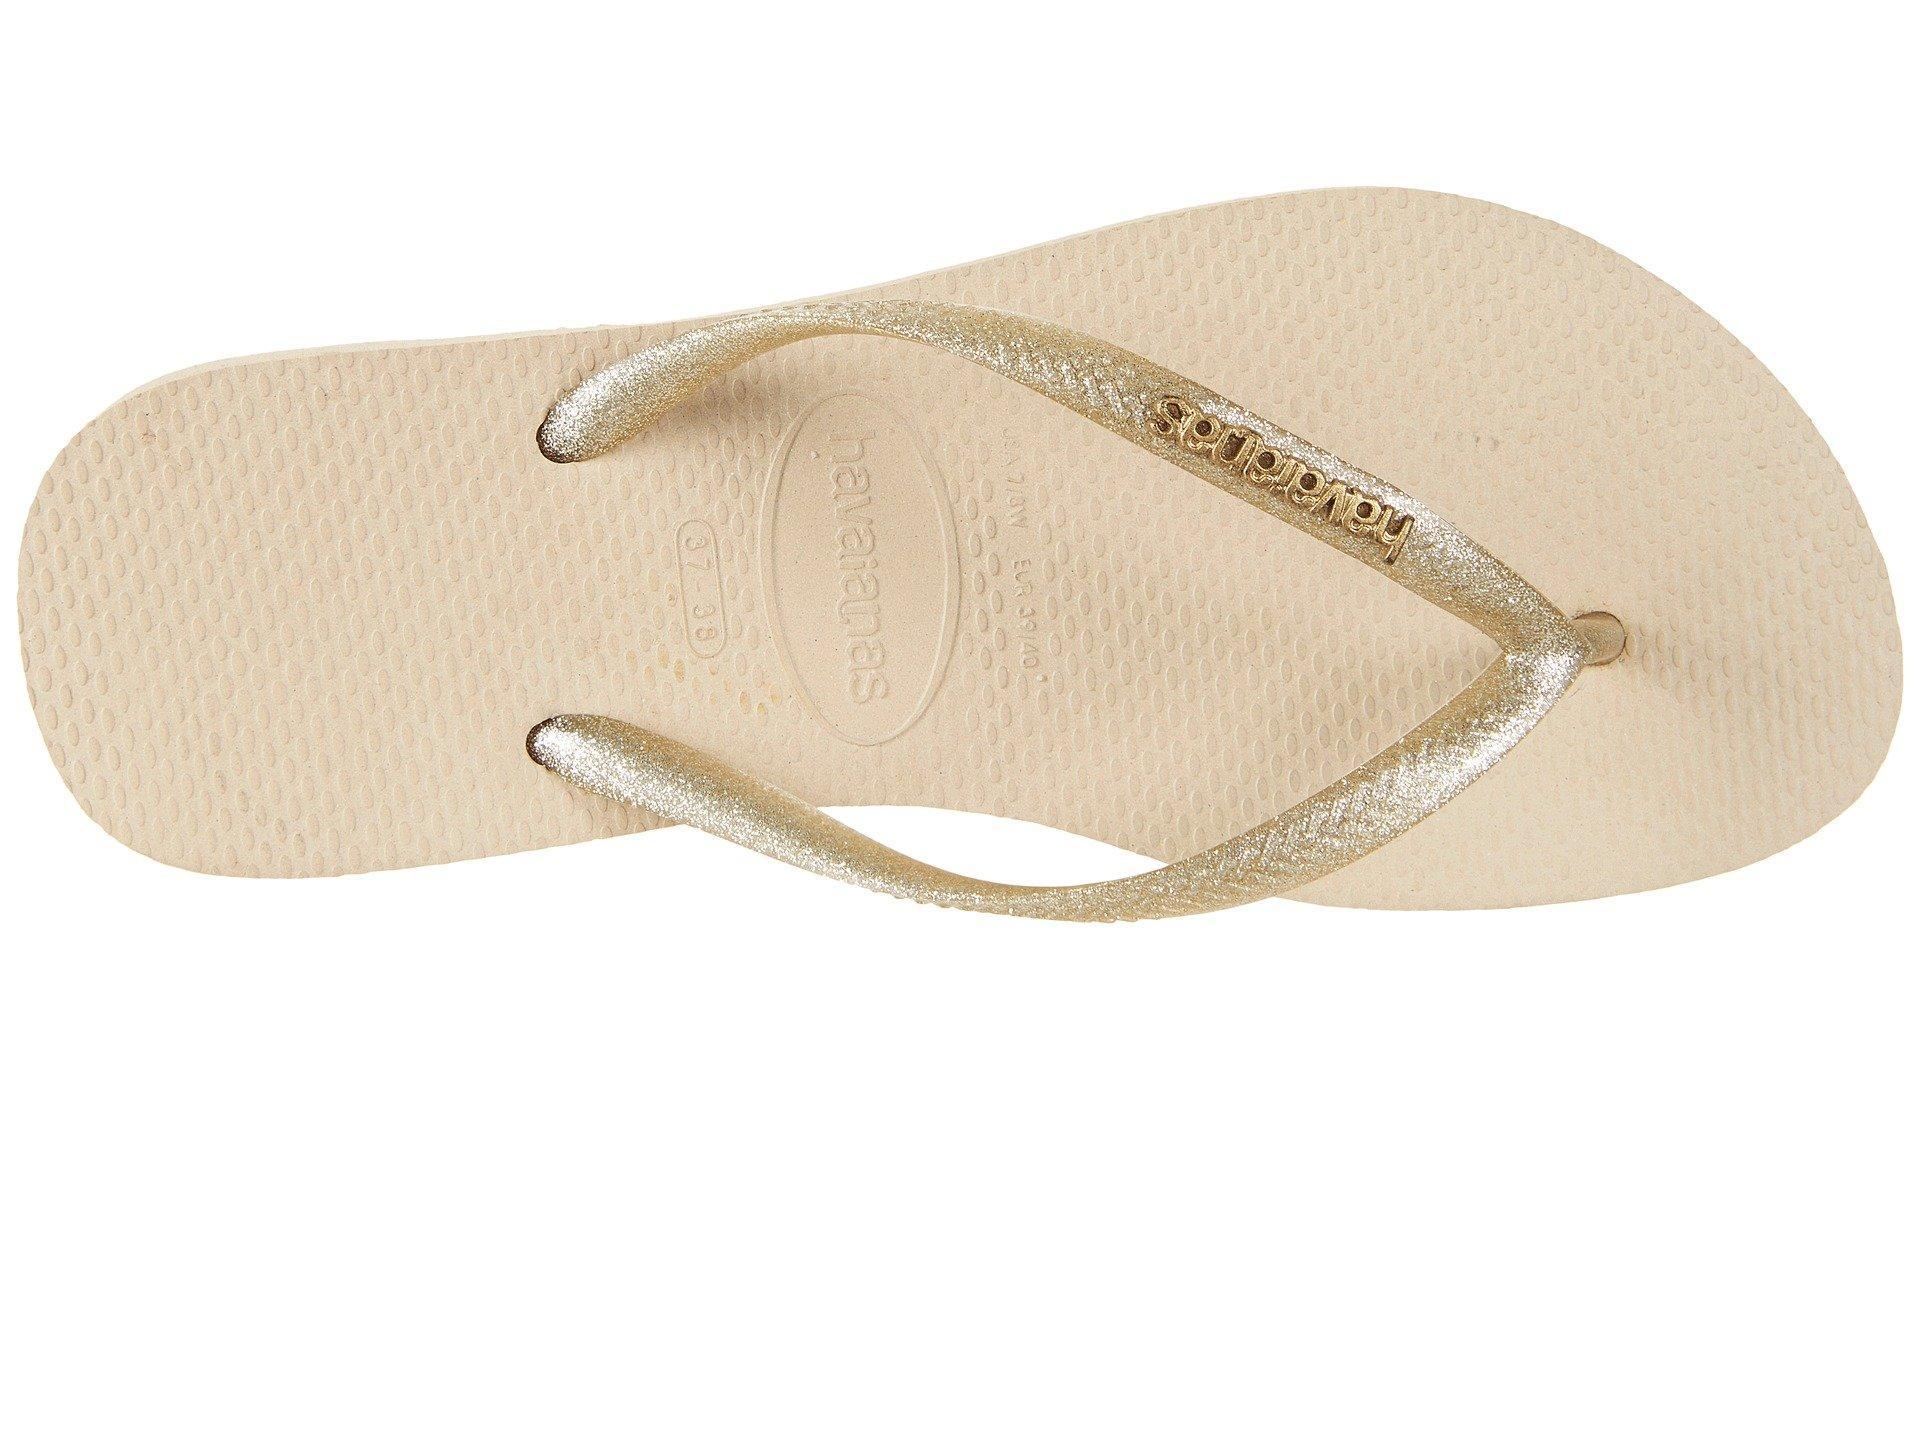 7b7bf7bdf18909 Havaianas - Slim Logo Metallic Flip Flops (white silver silver) Women s  Sandals. View fullscreen